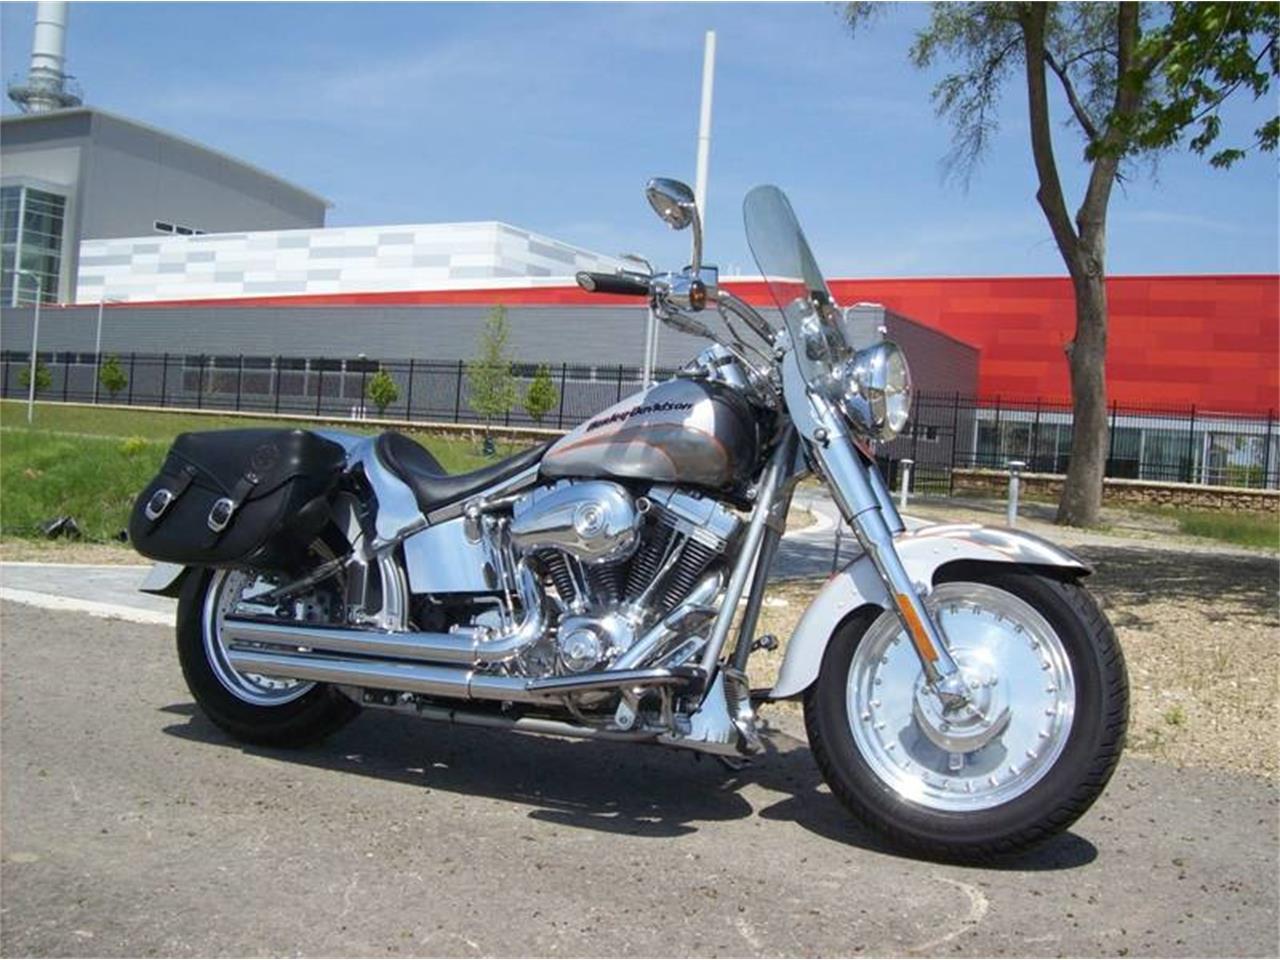 For Sale: 2005 Harley-Davidson Fat Boy in Holland, Michigan